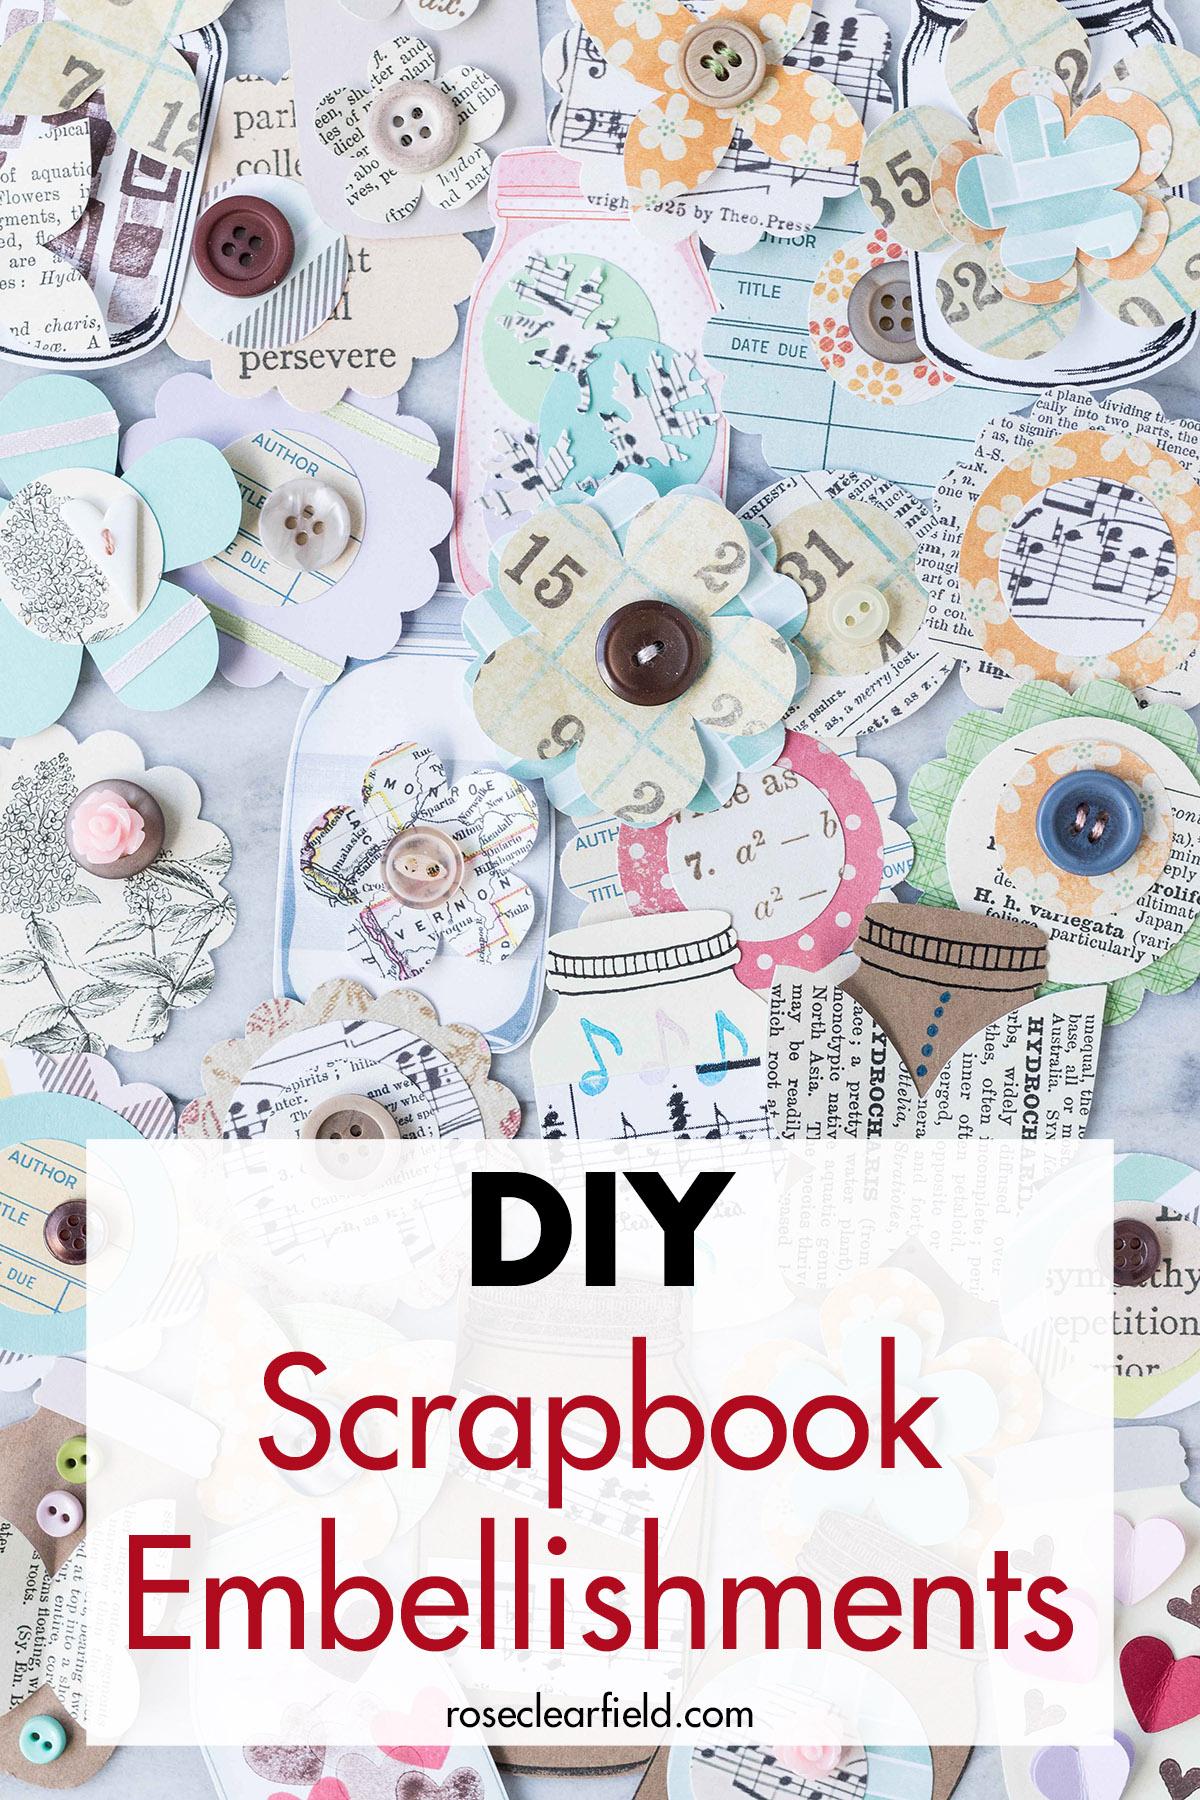 diy scrapbook embellishments • rose clearfield